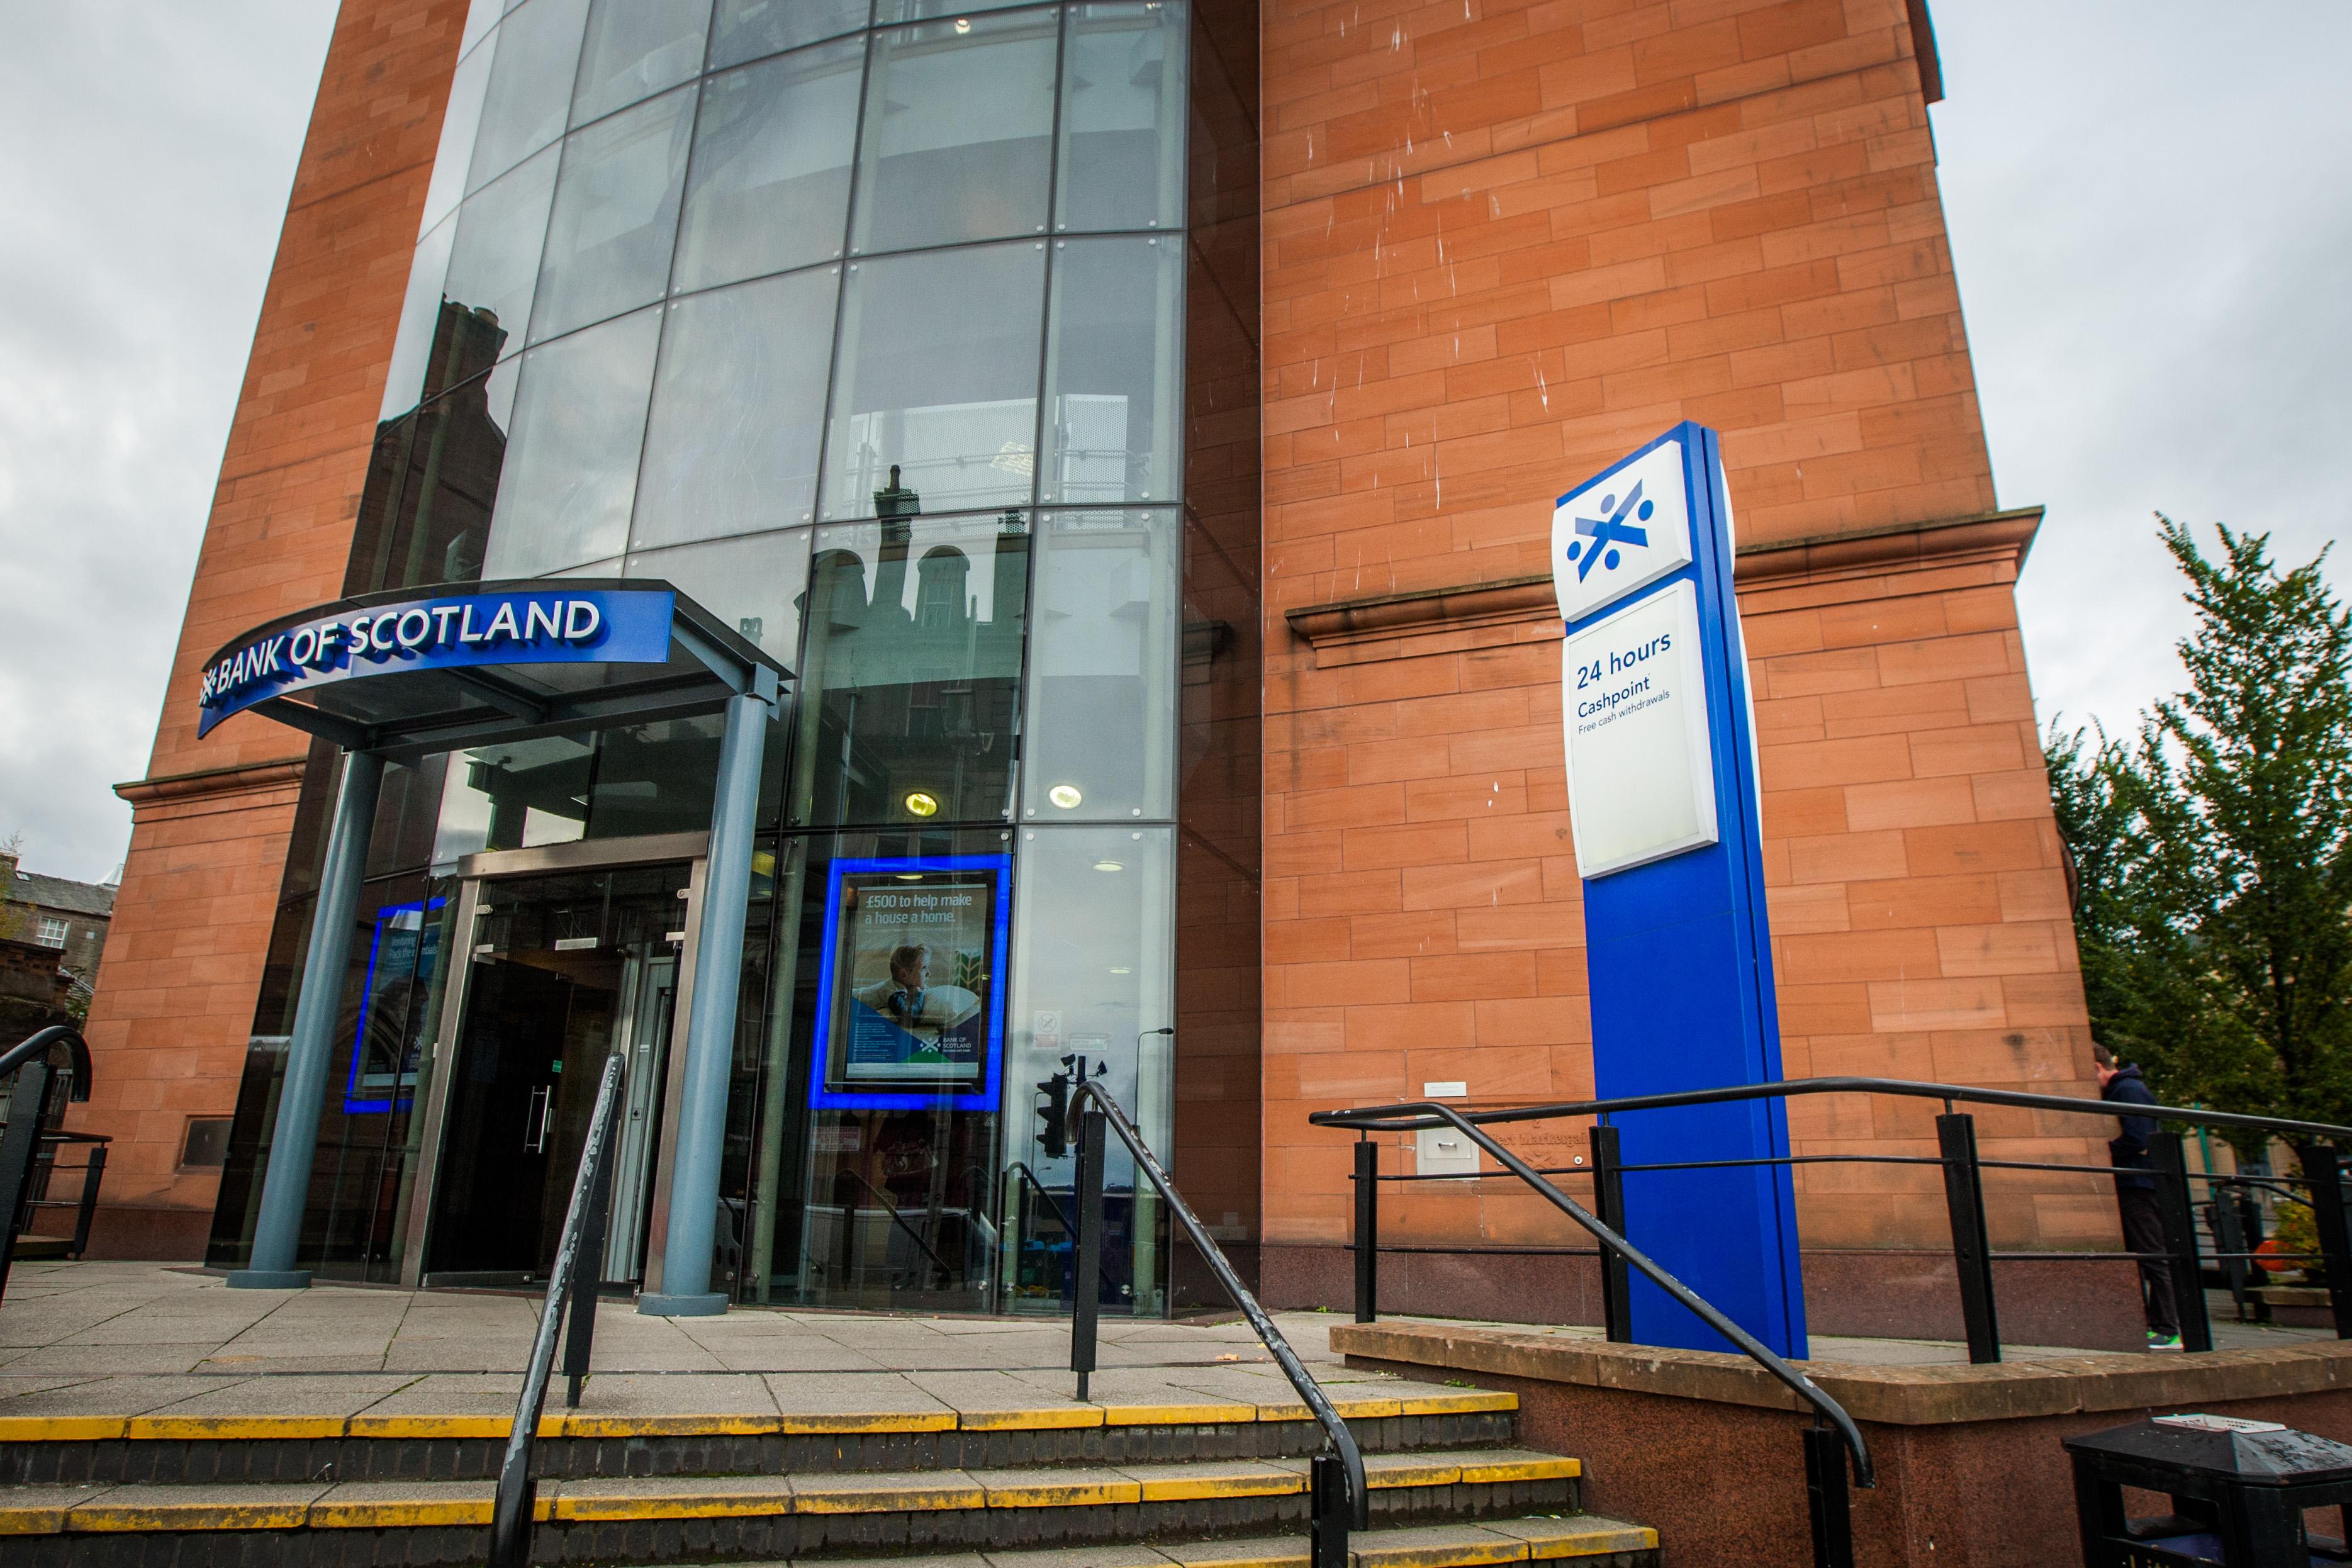 Bank of Scotland, West Marketgait, Dundee